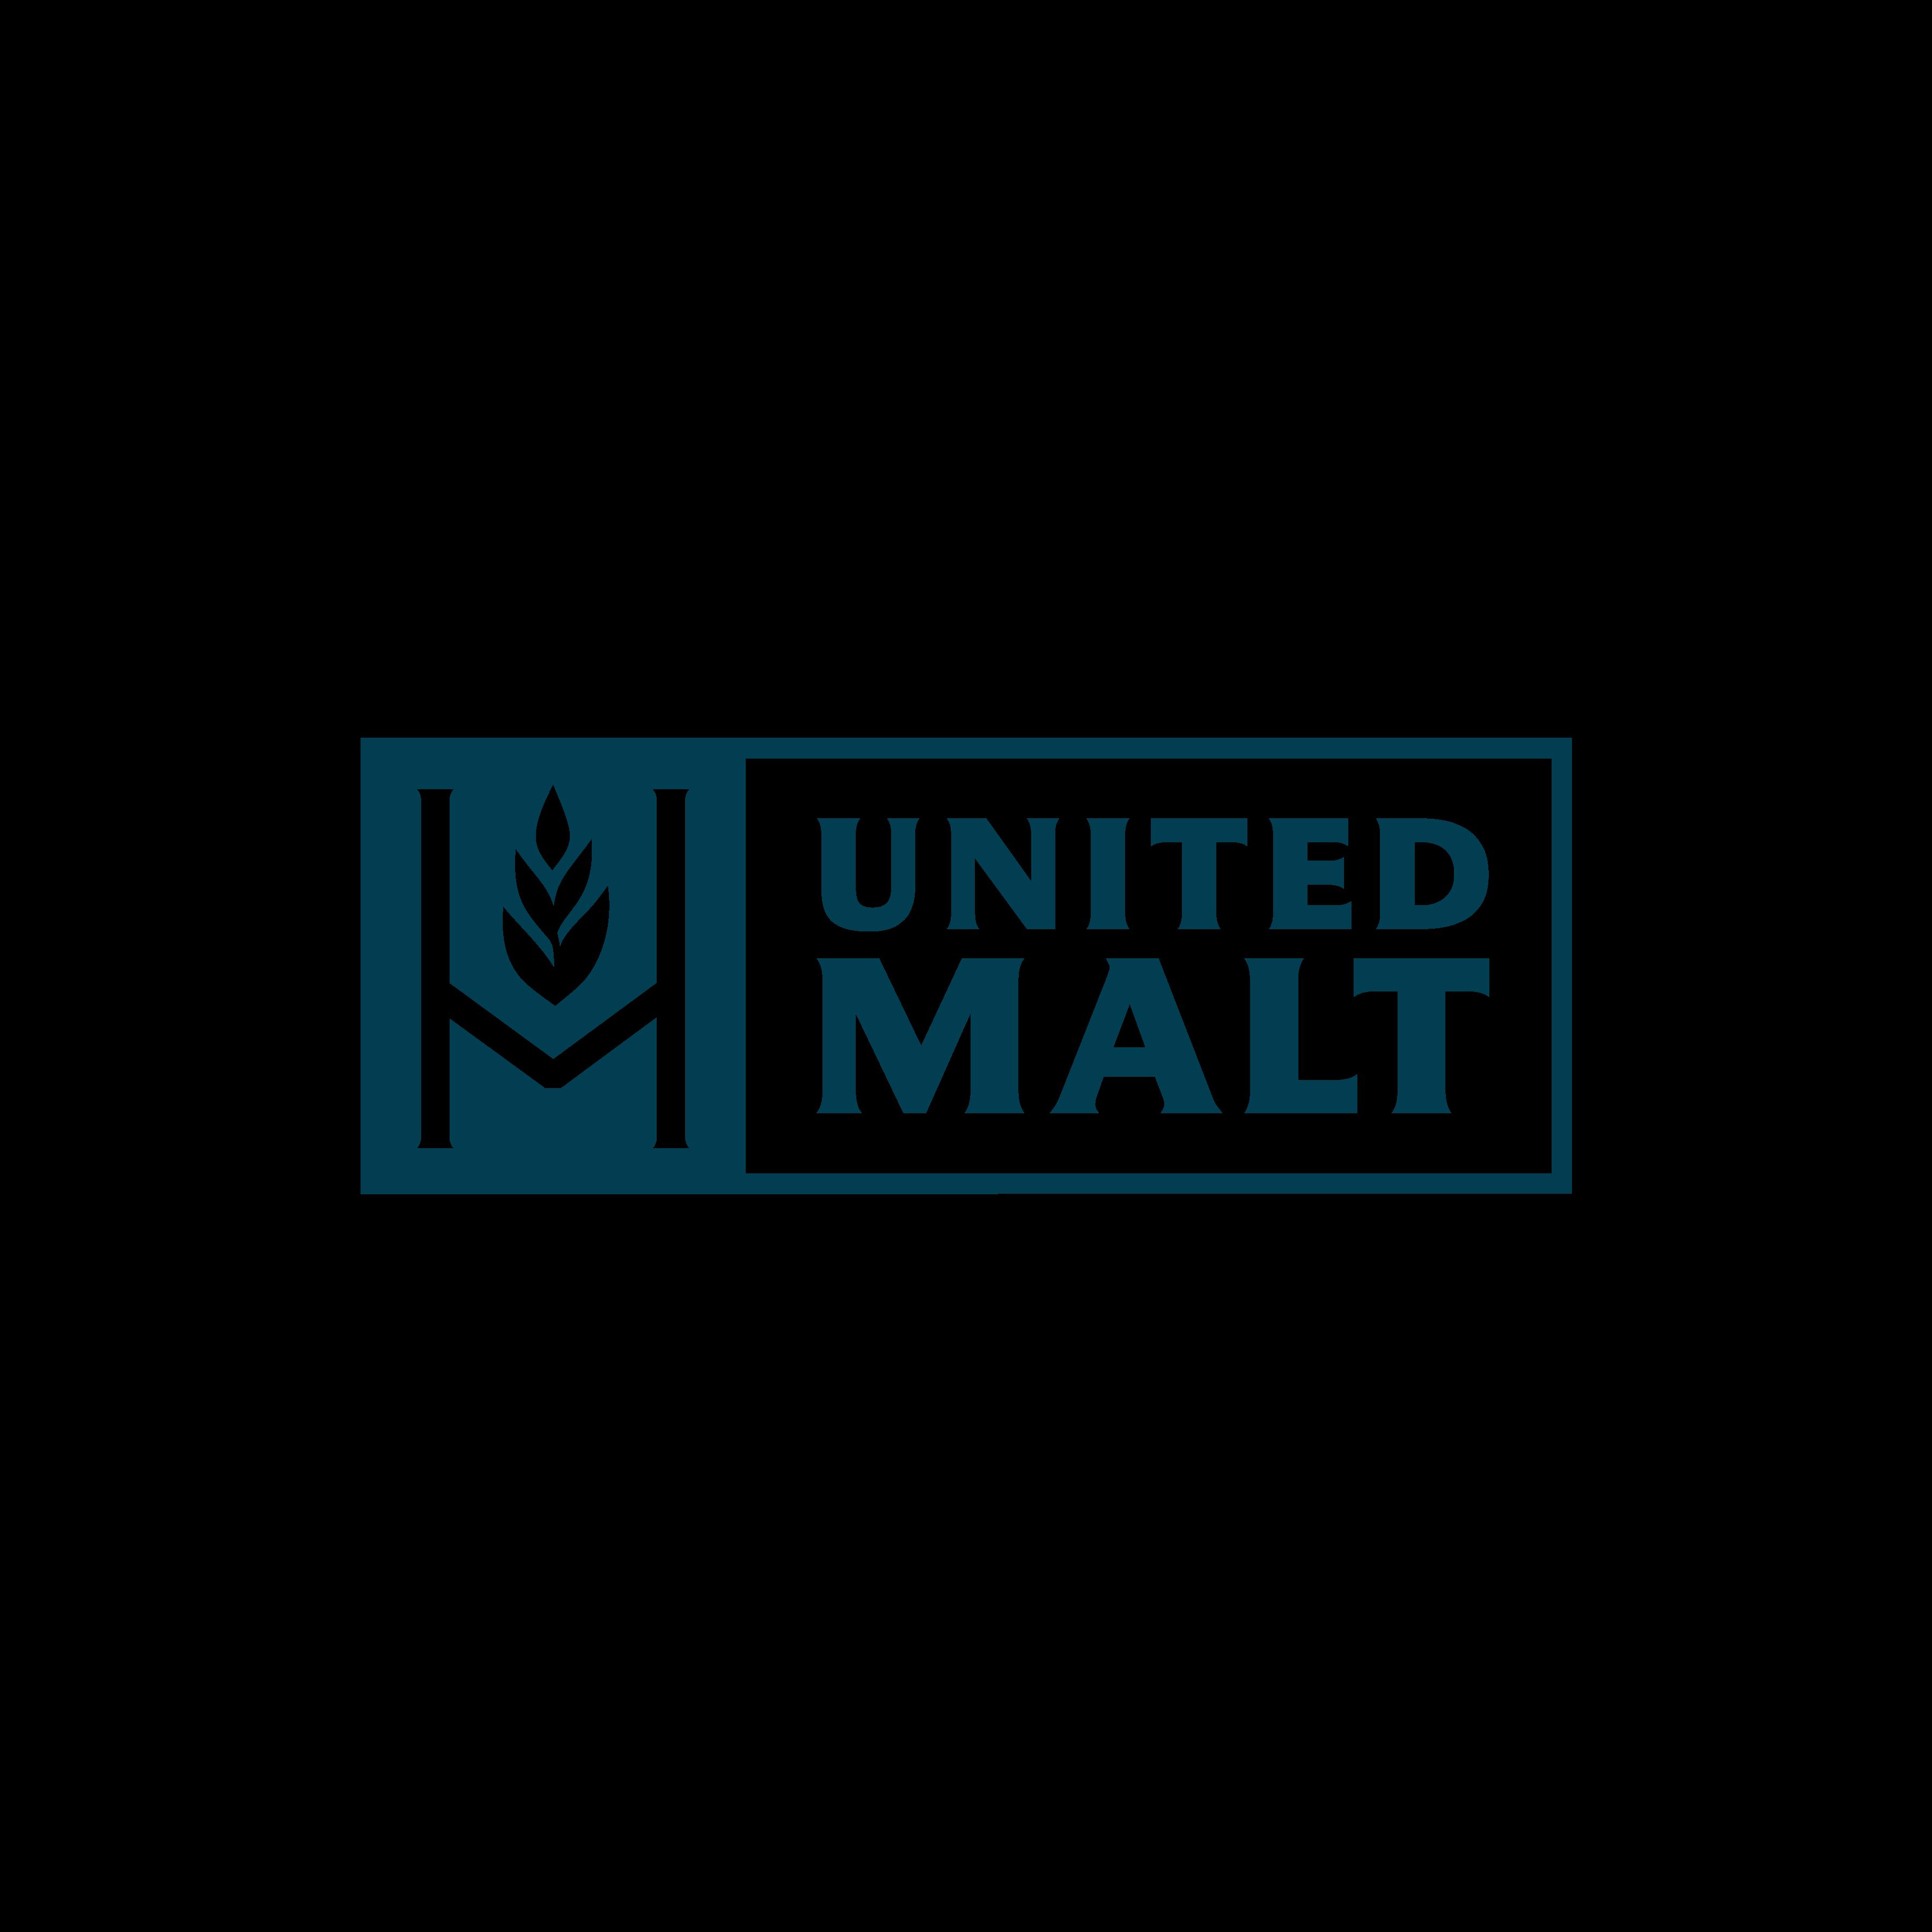 ASX:UMG logo